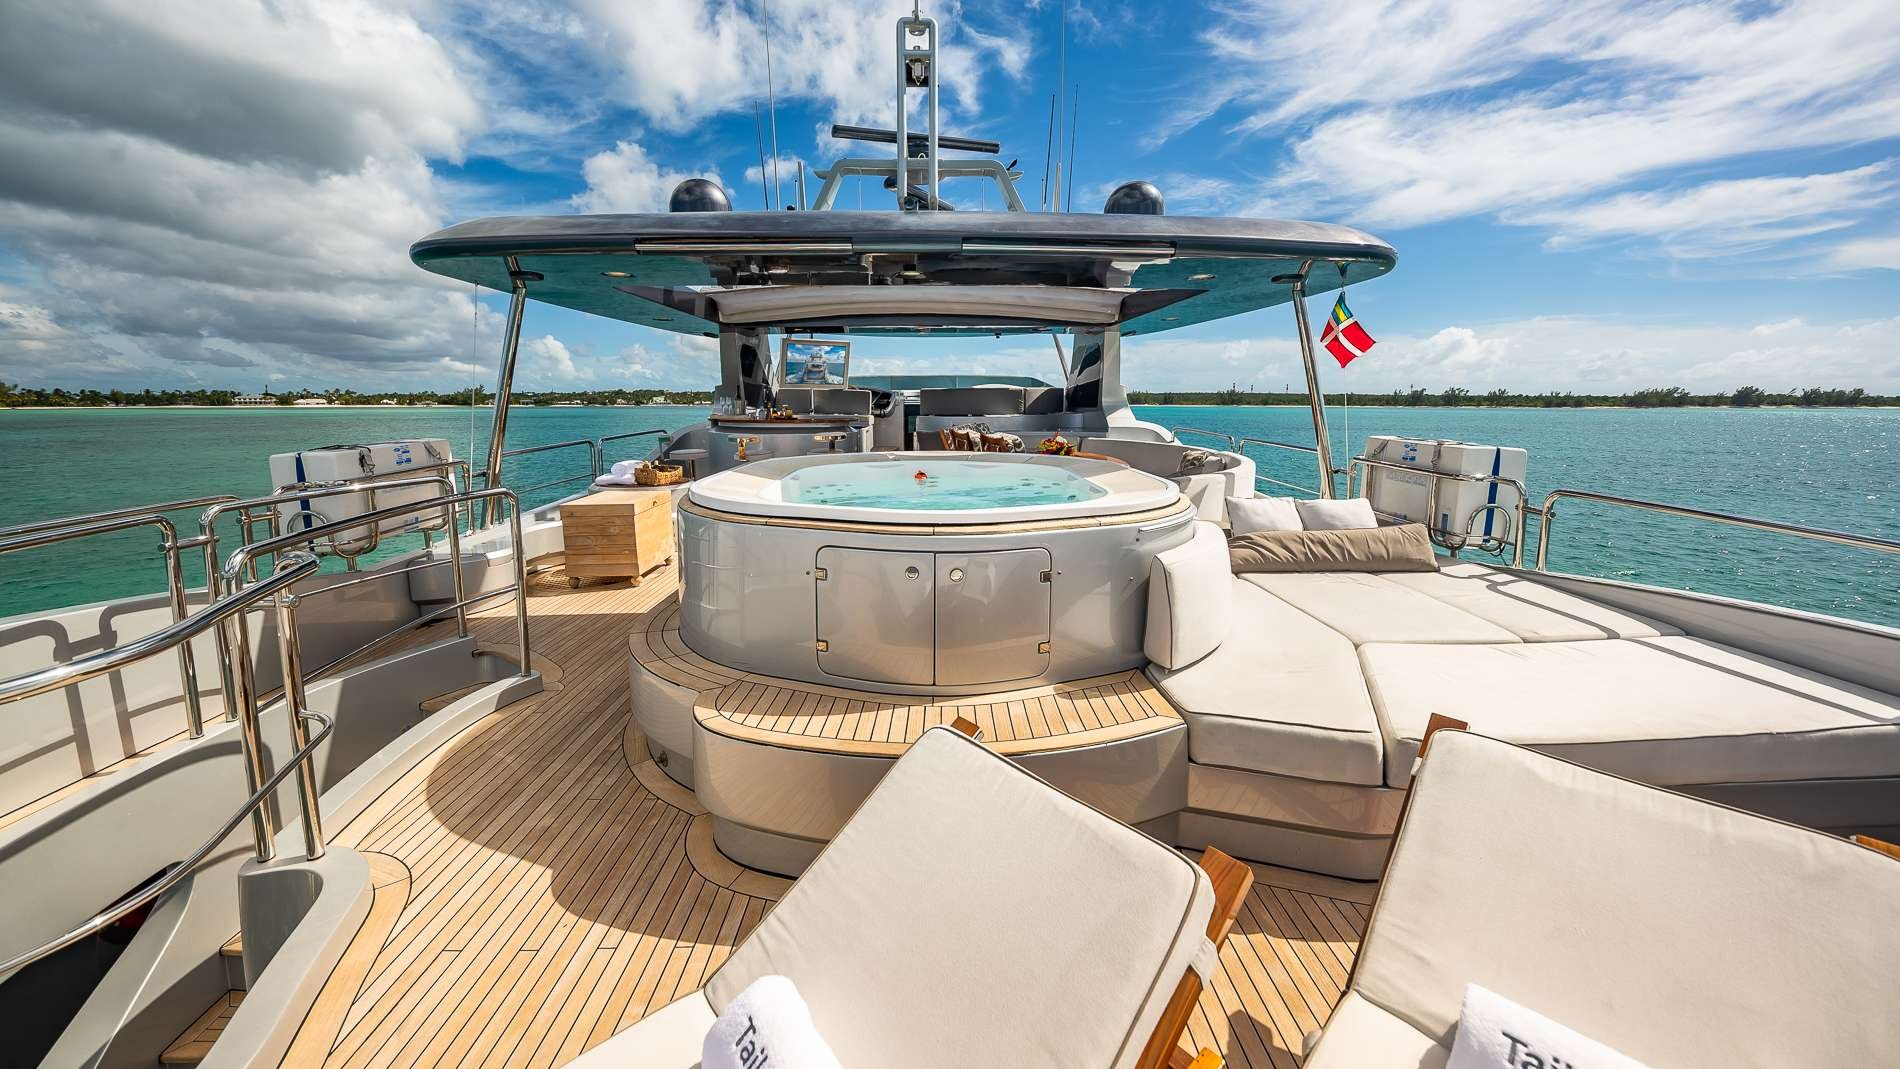 Motor Yacht 'TAIL LIGHTS' Flybridge, 12 PAX, 6 Crew, 116.00 Ft, 35.00 Meters, Built 2011, Azimut, Refit Year 2016